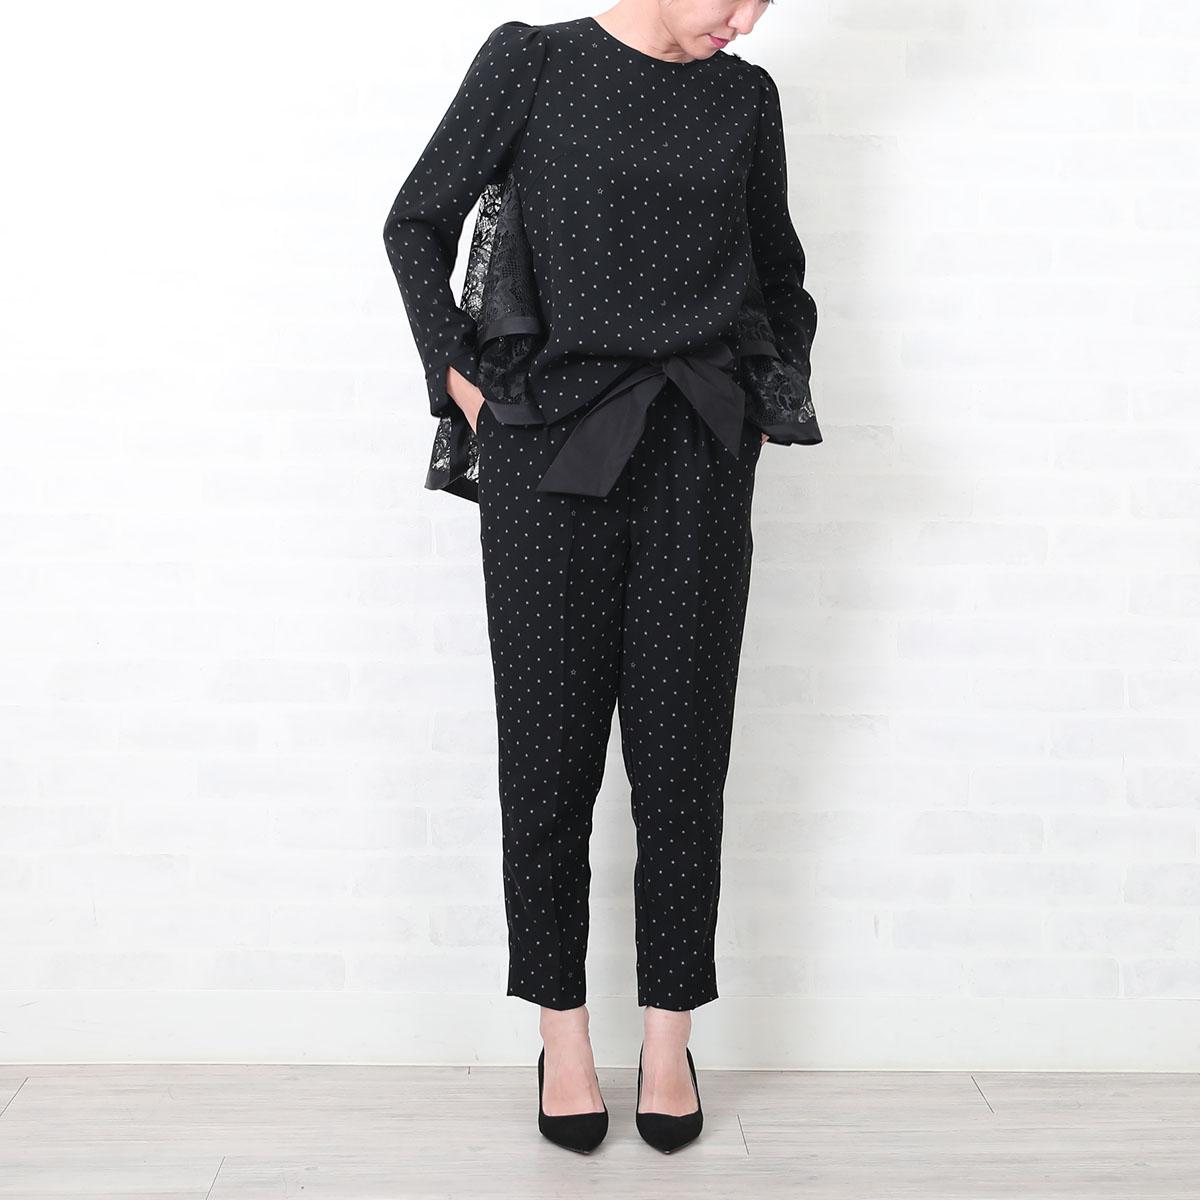 『Dress Knit』Dot black Back Tiered Lace Tops画像